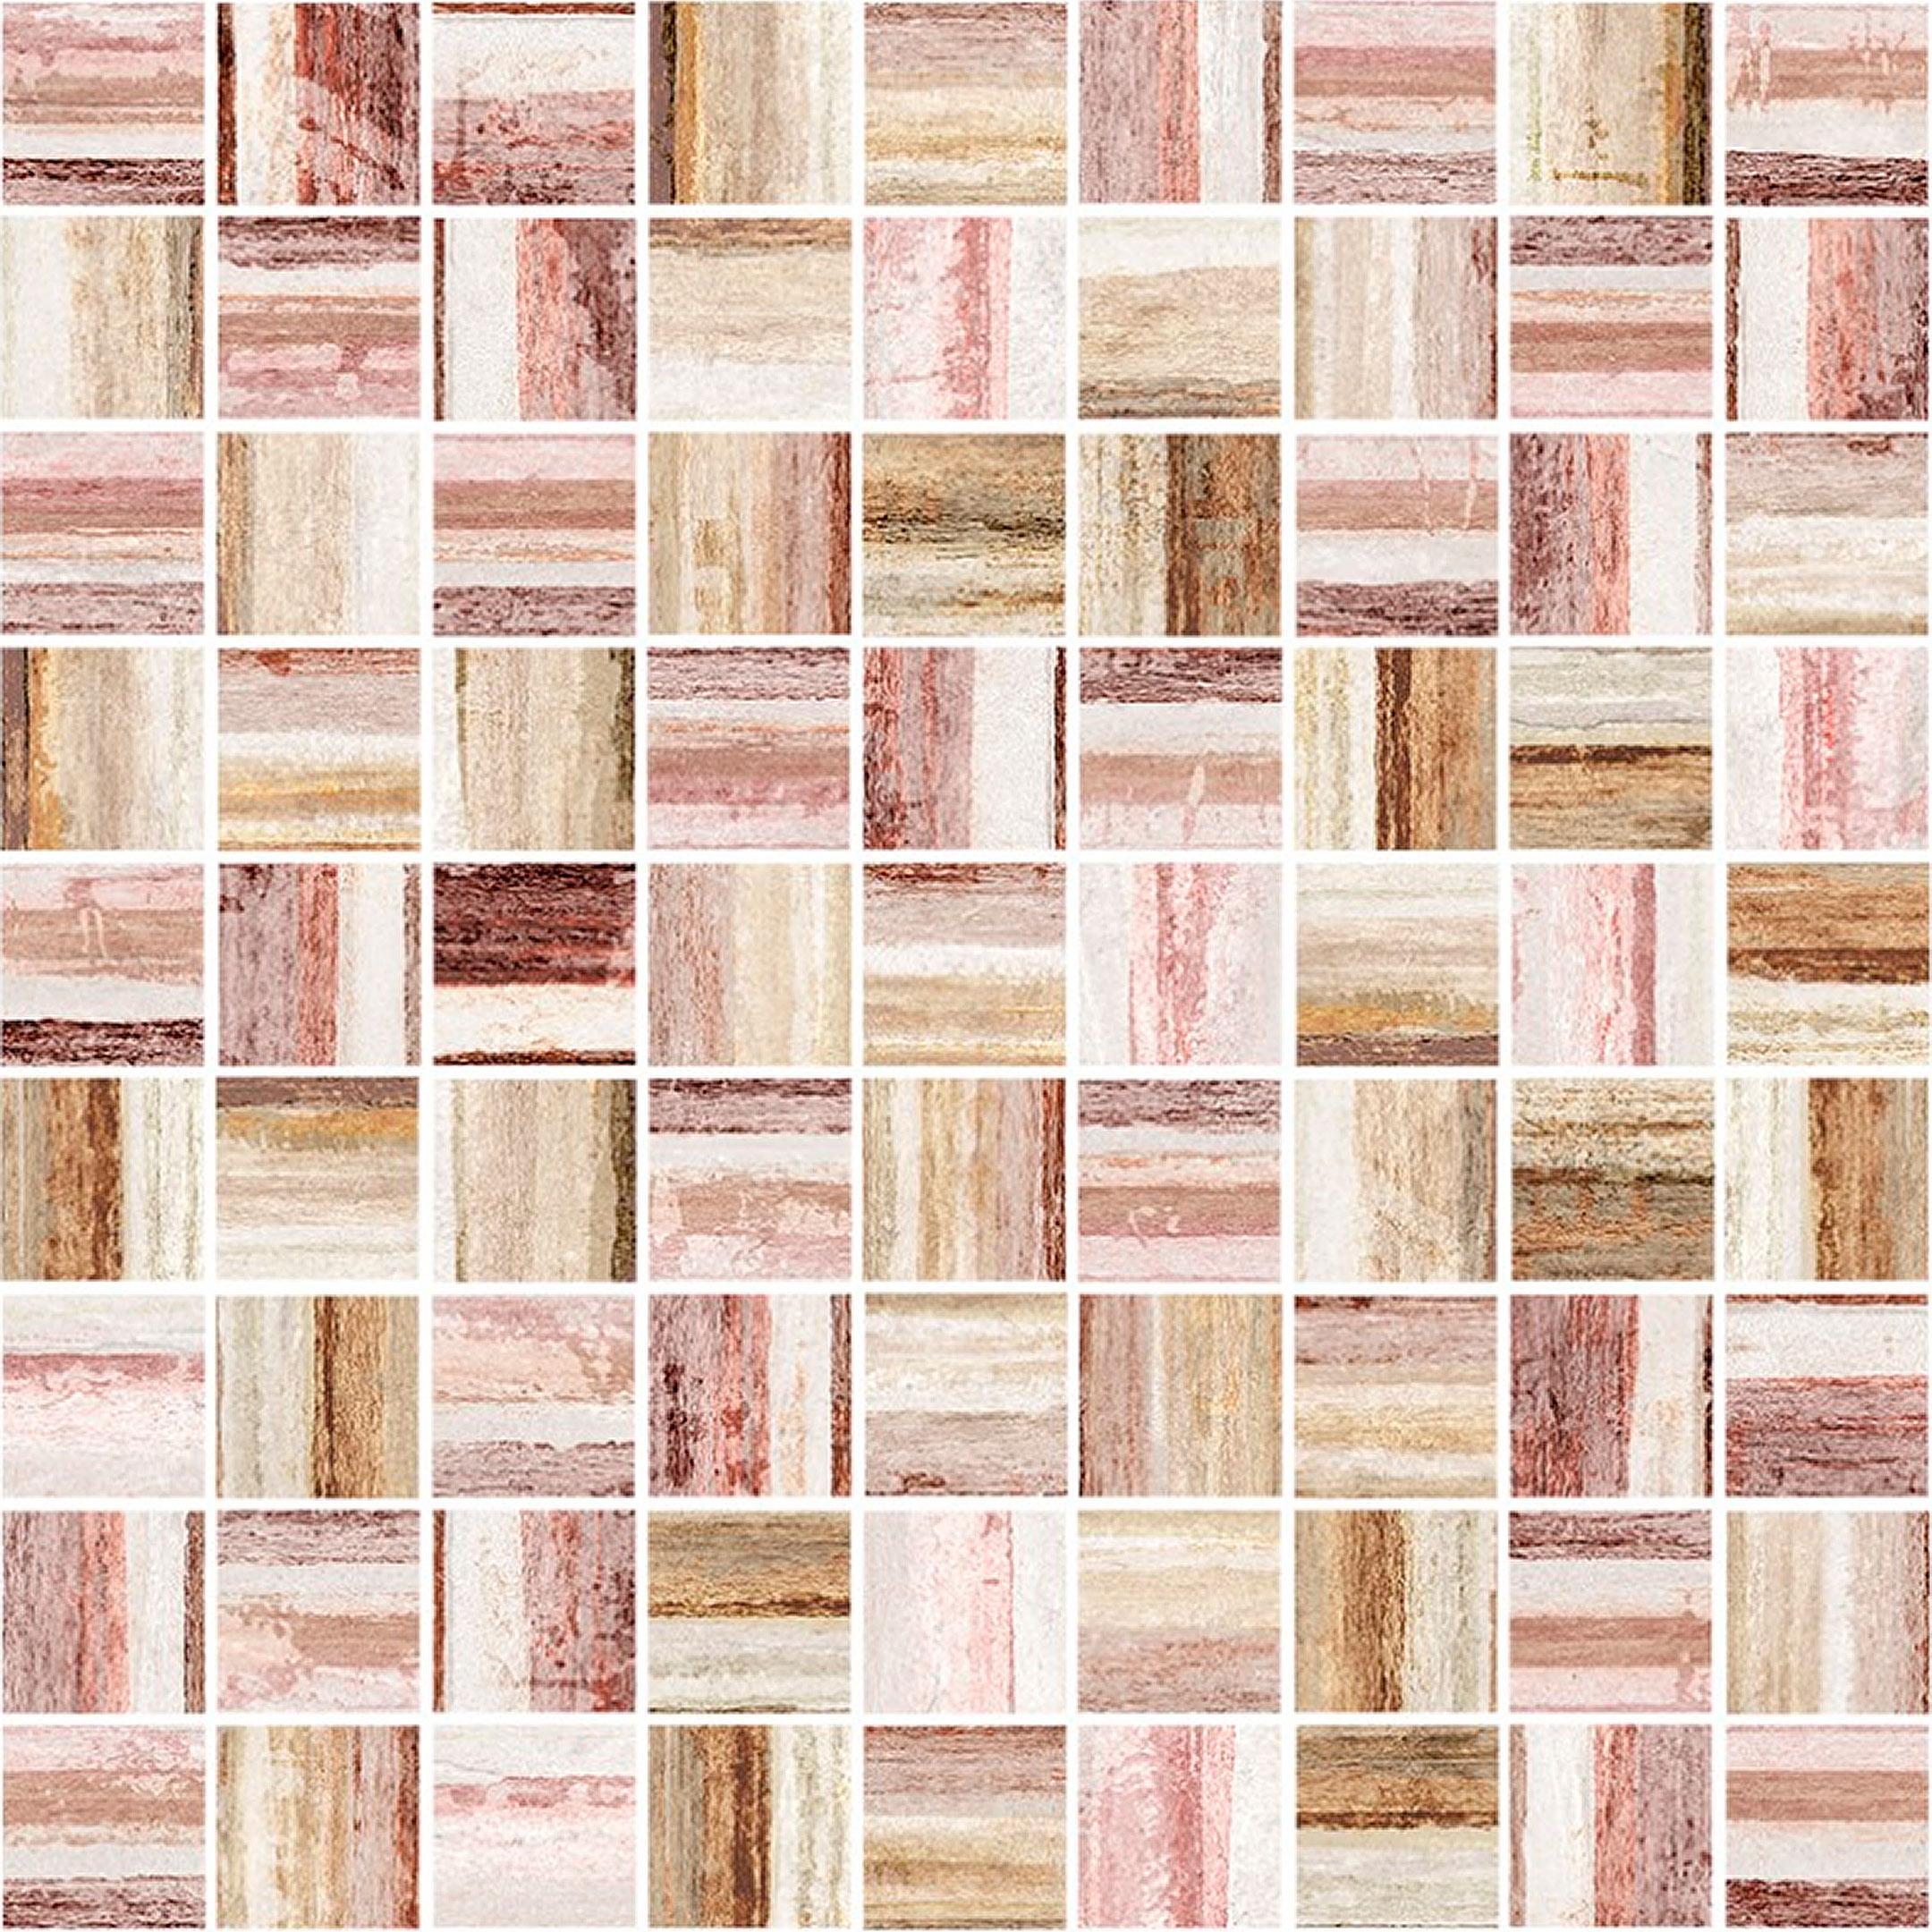 цена Плитка декор Cersanit Alba мозаика многоцветная 300x300x8,5 мм